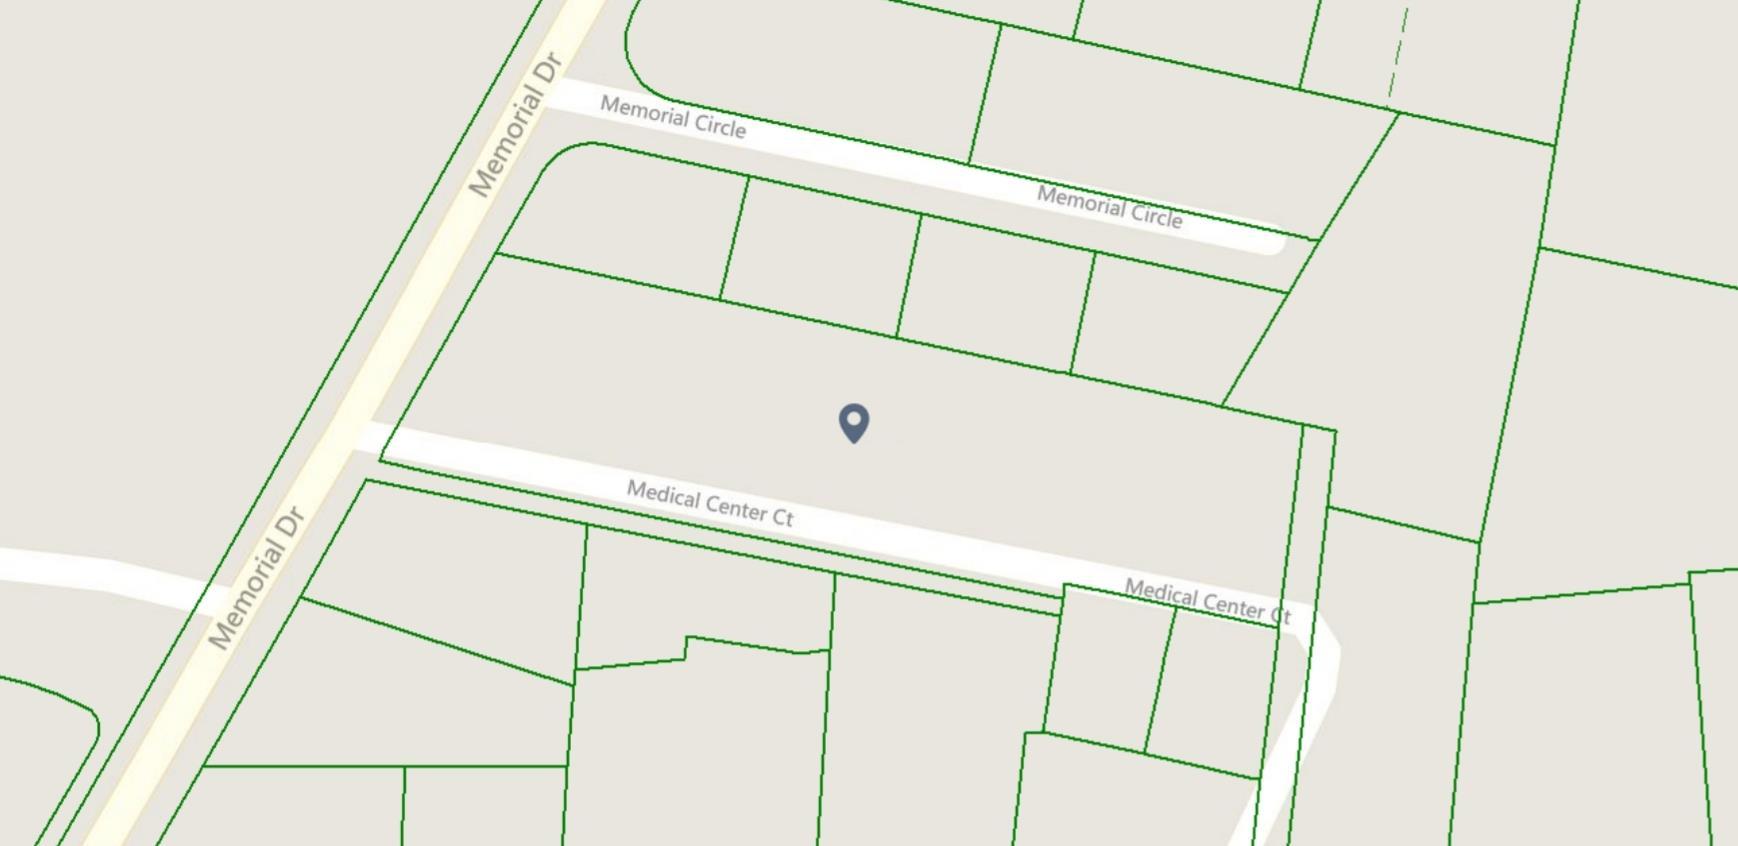 1724 Memorial Dr, Clarksville, TN 37043 - Clarksville, TN real estate listing